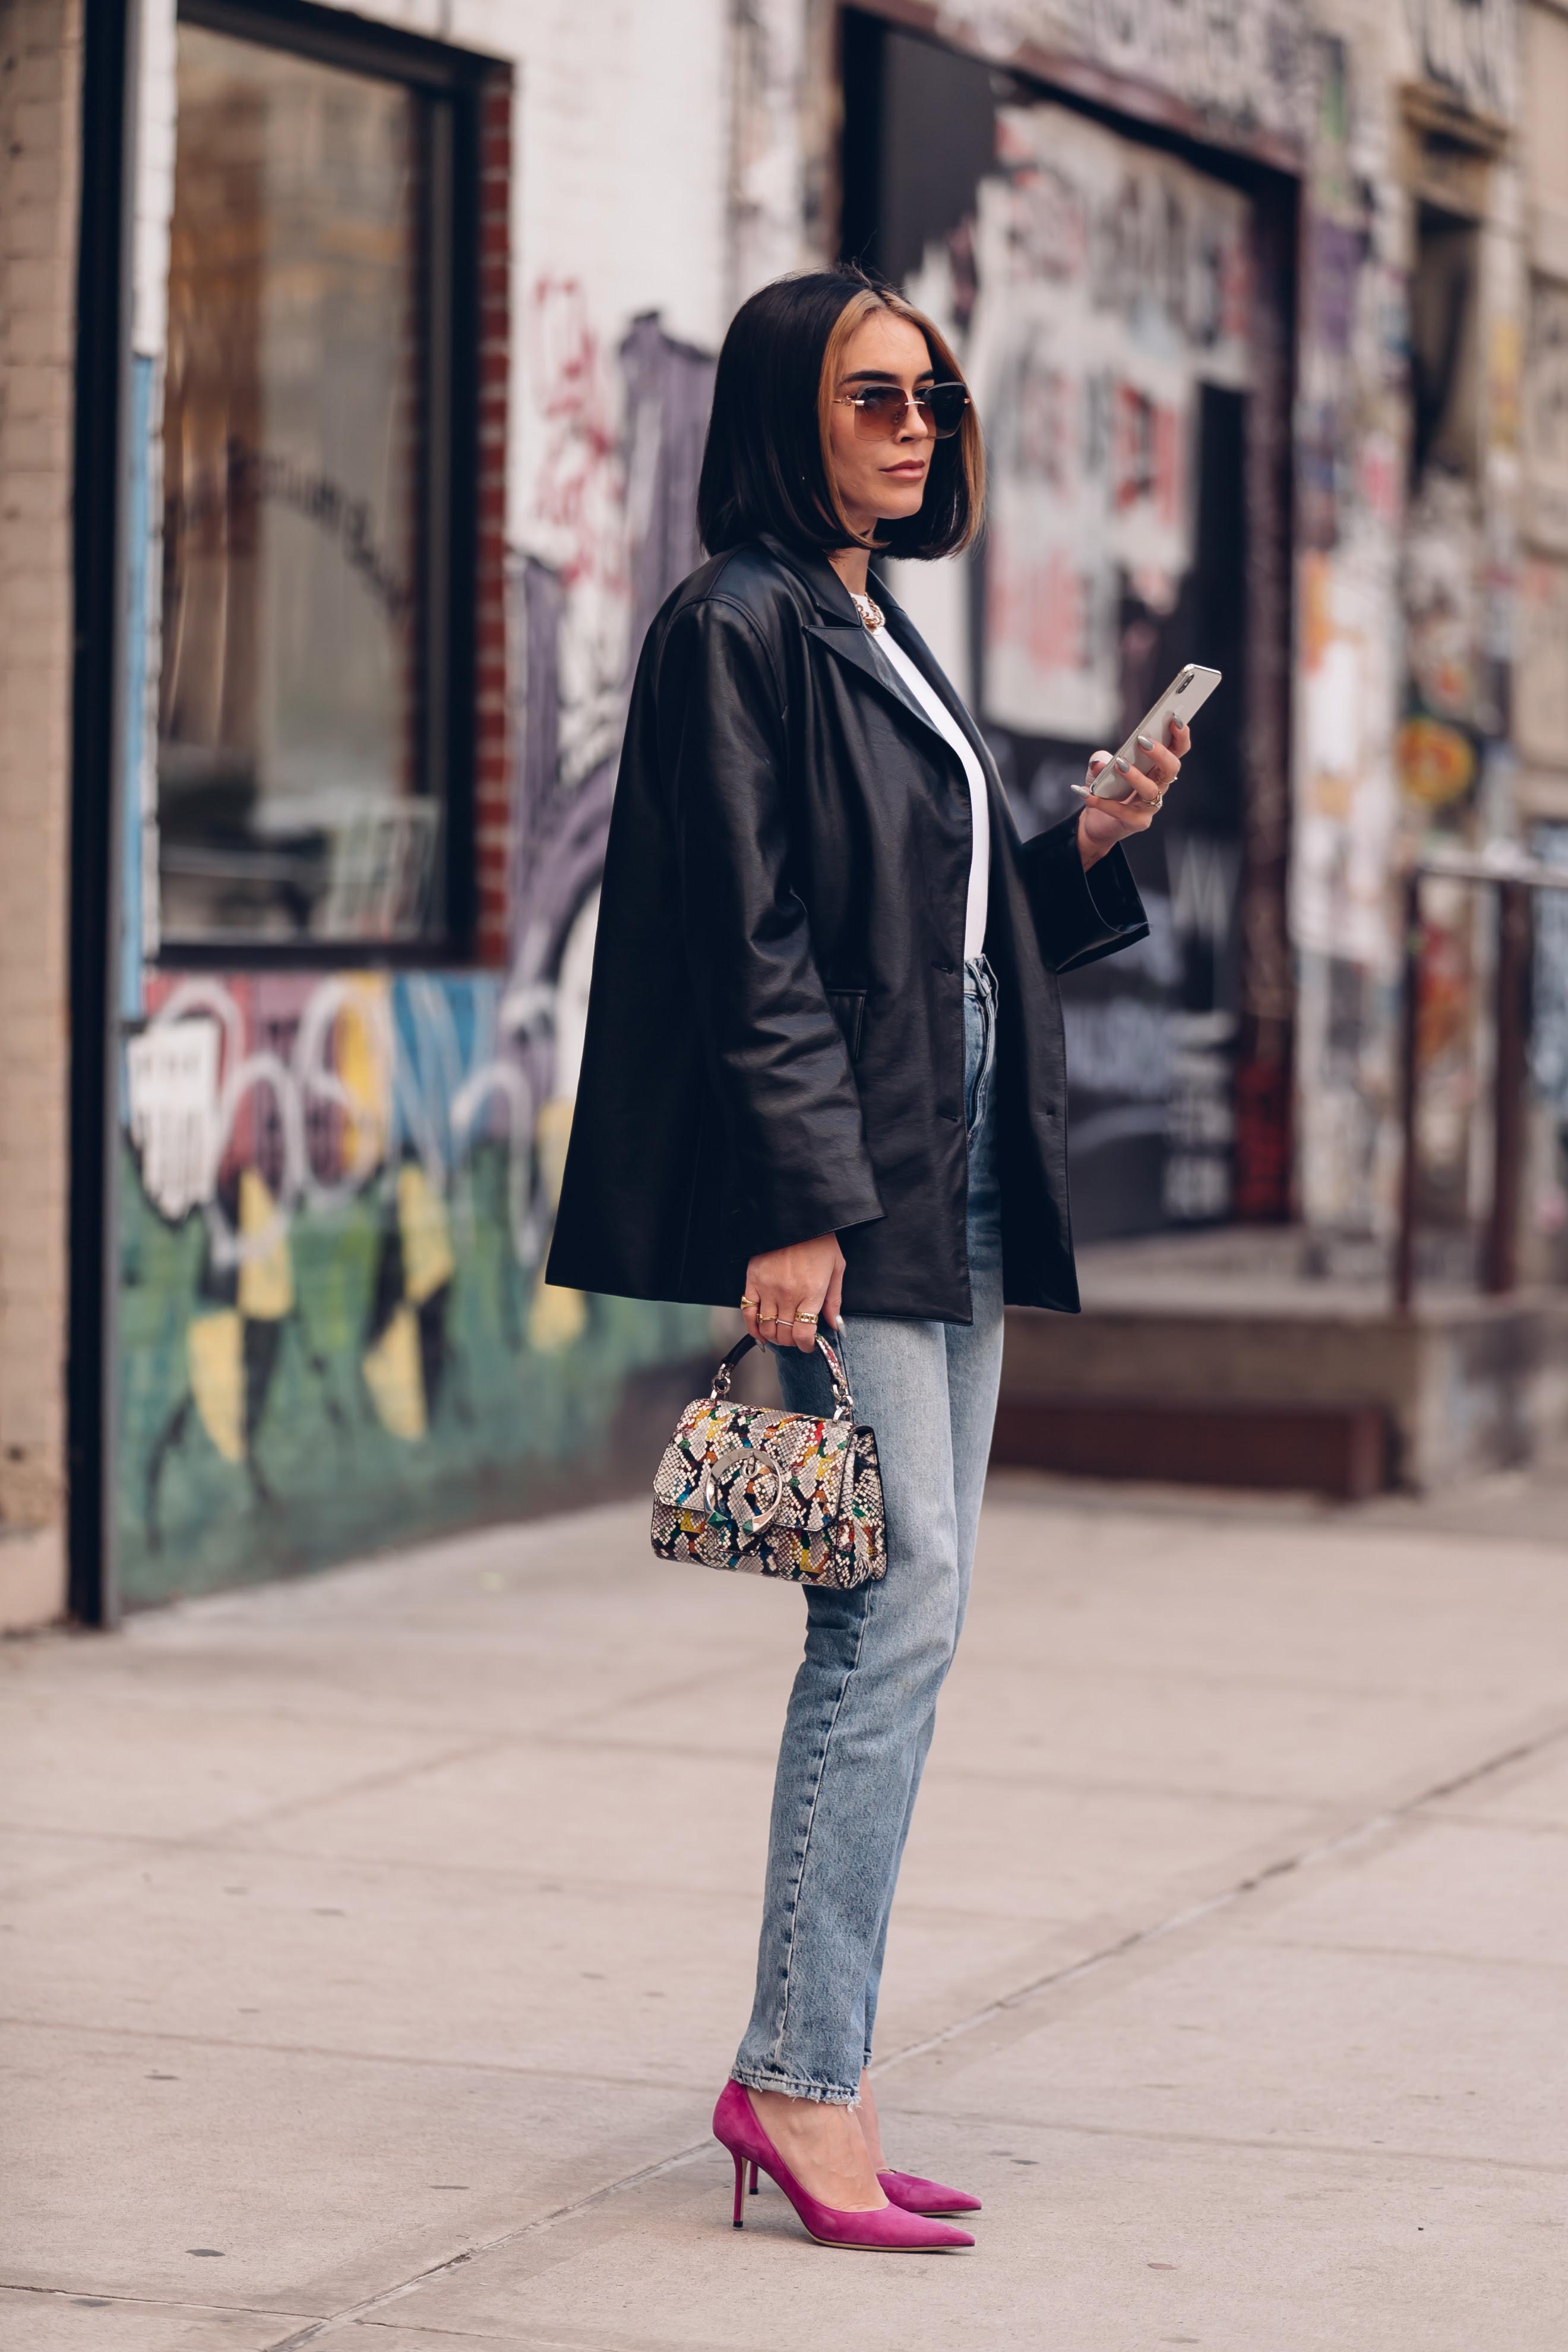 4e2415b1 862c 41a8 ac50 db7b8e84464a - Las influencers que apostaron por Jimmy Choo durante la New York  Fashion Week